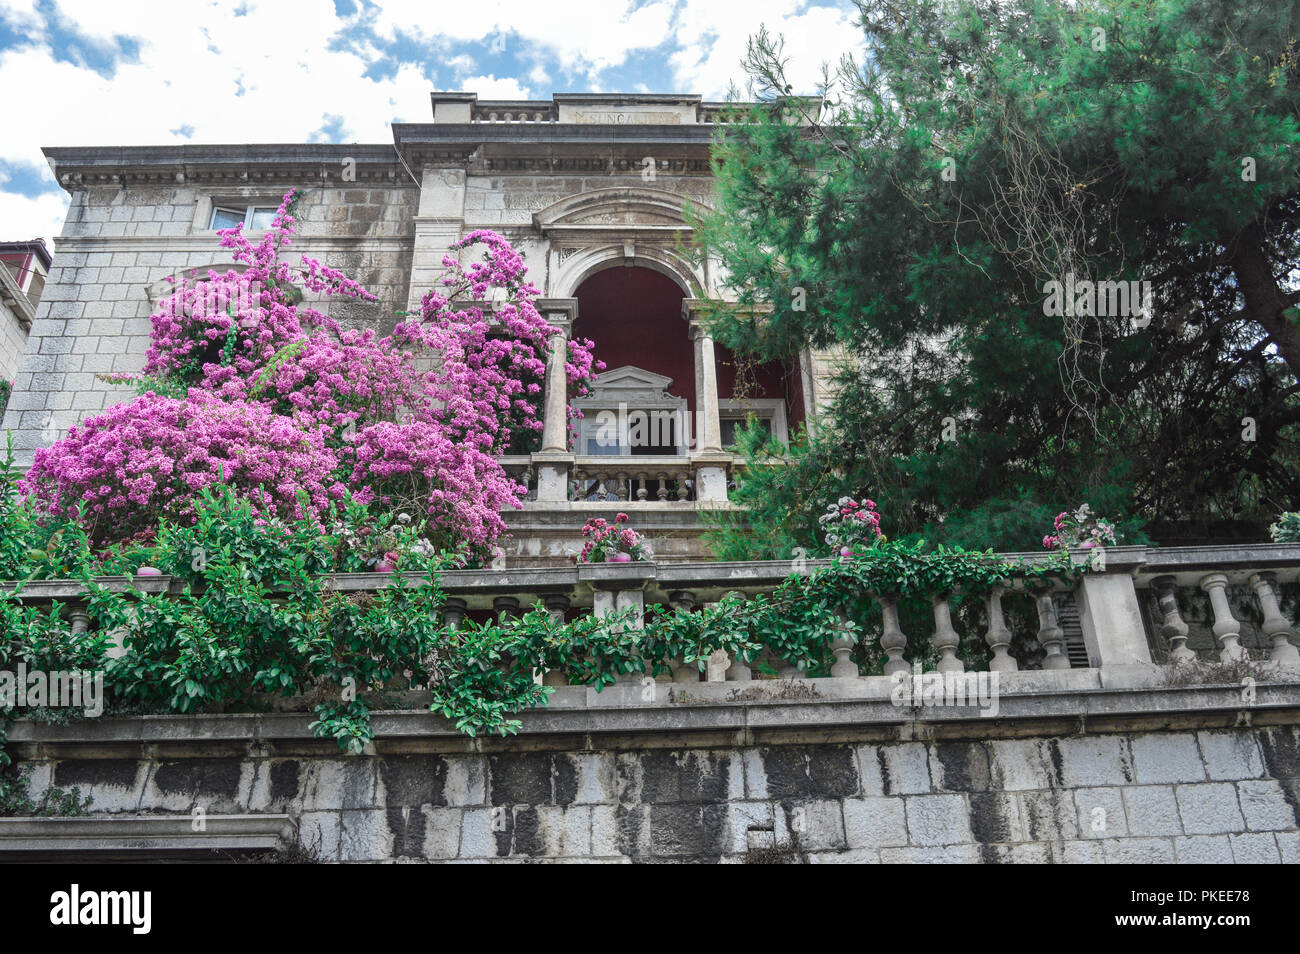 Traditional croatian building surrounded by purple flowers, Dubrovnik, Croatia, Balkan, Hvarska Stock Photo